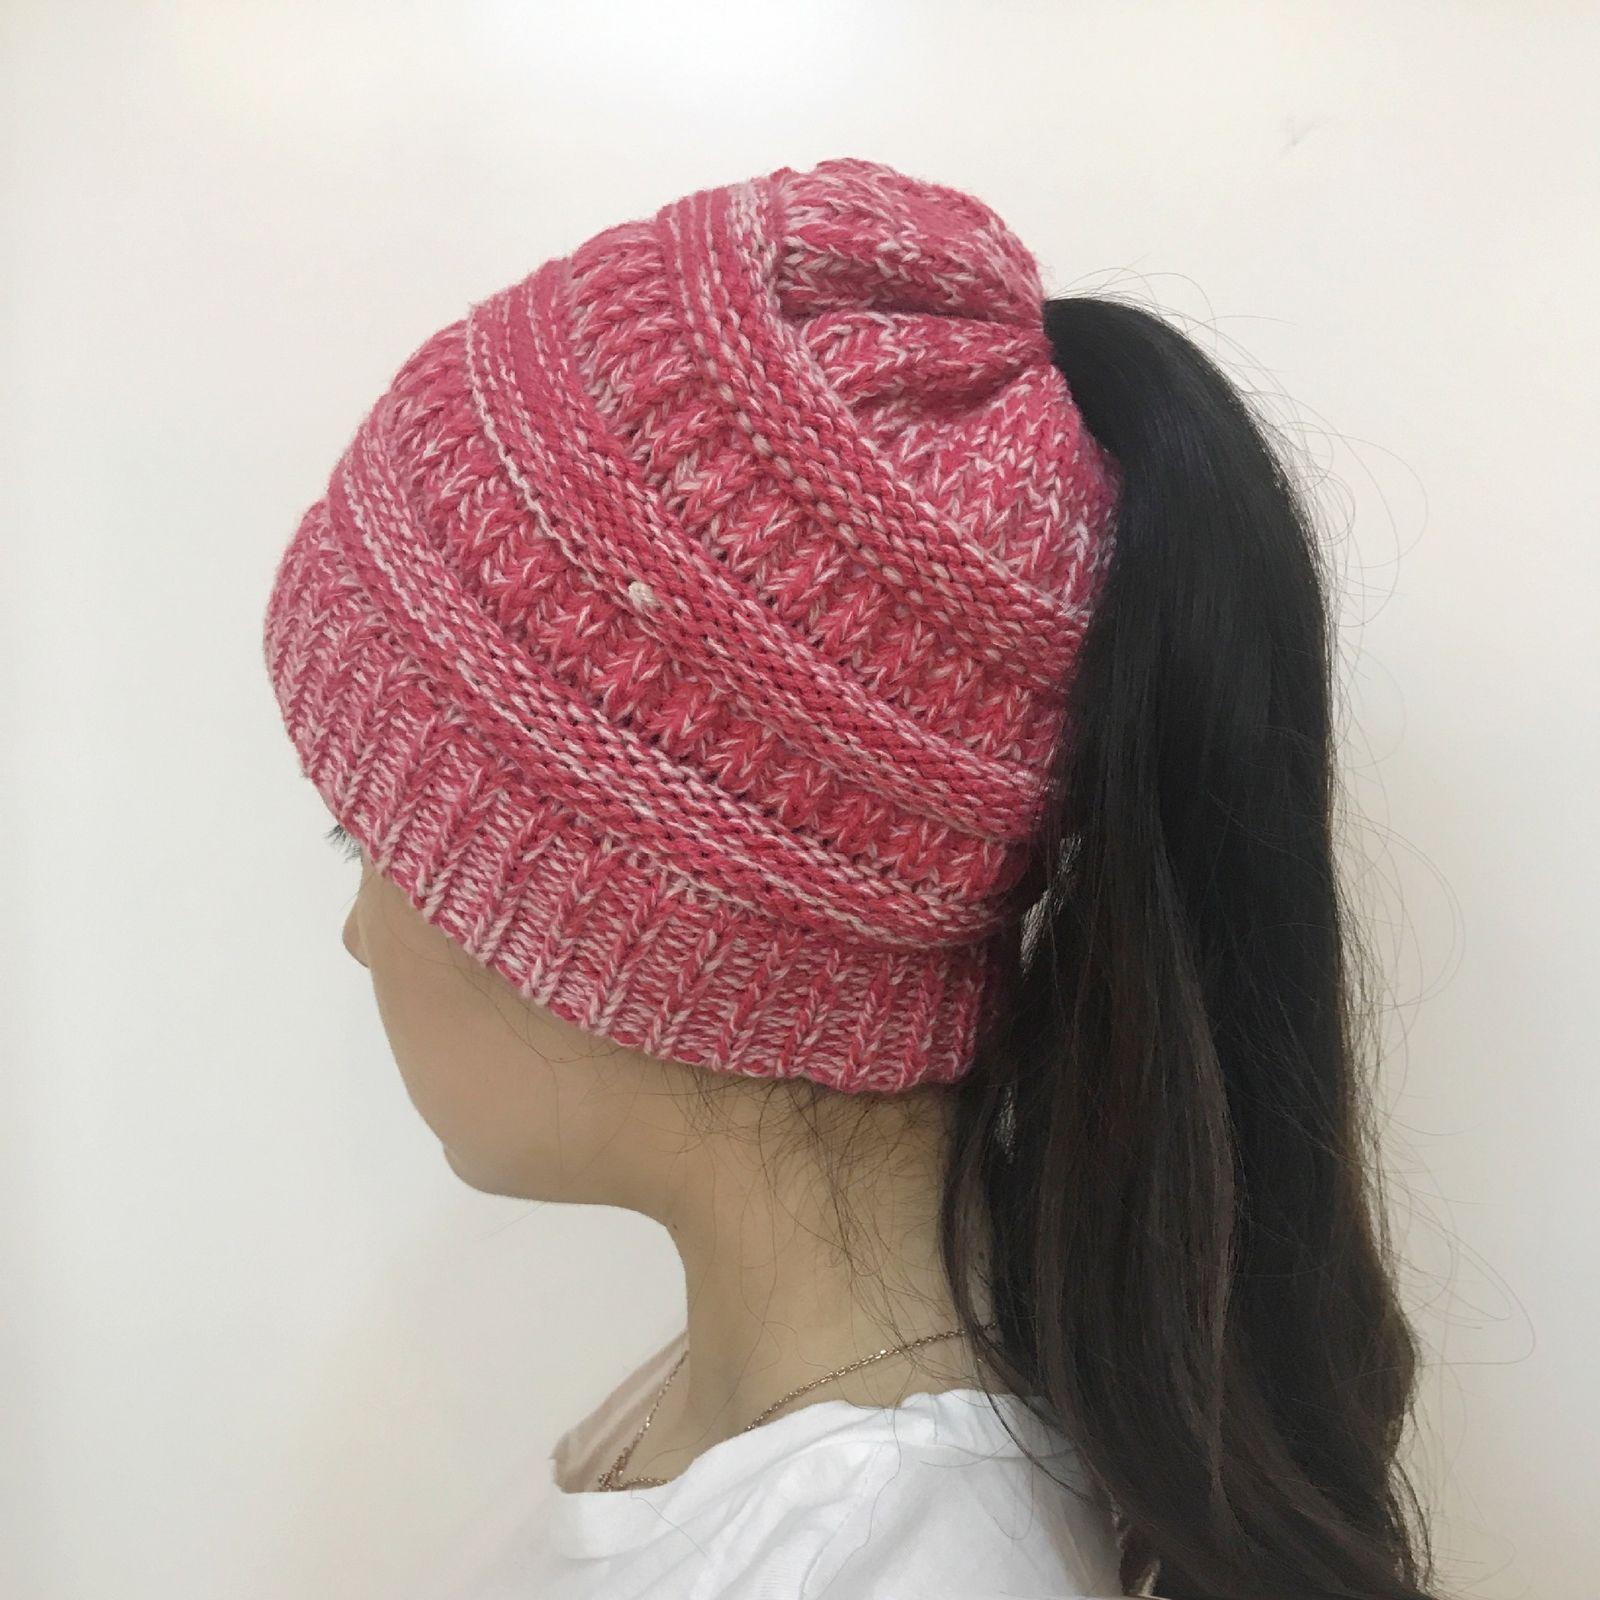 3afd06522da 2017 Winter Women Beanietail Messy High Bun Ponytail Stretchy Knit Beanie  Skull Hats Stylish Hole Hat AU